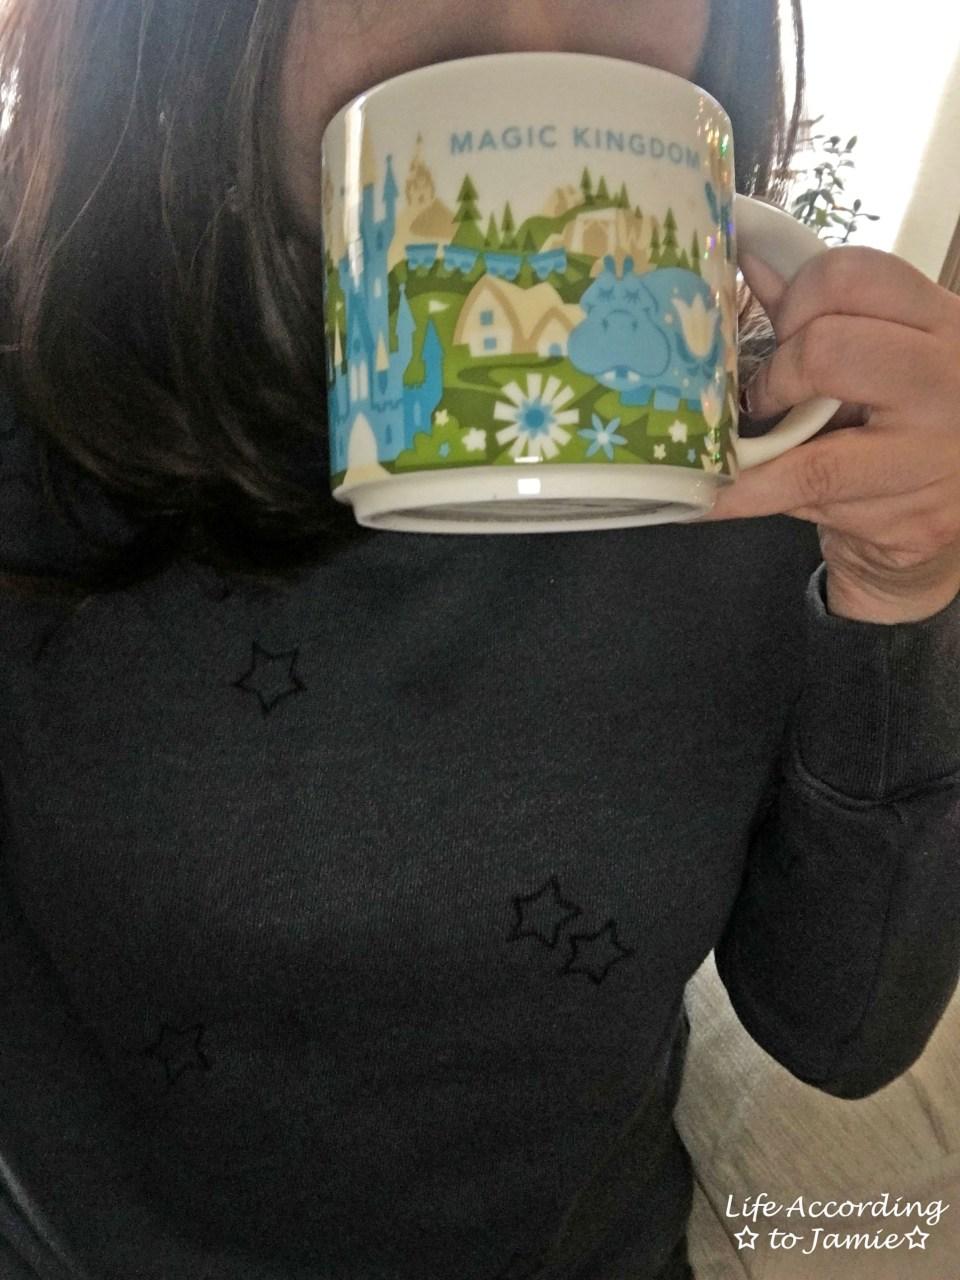 Starbucks - Magic Kingdom Mug